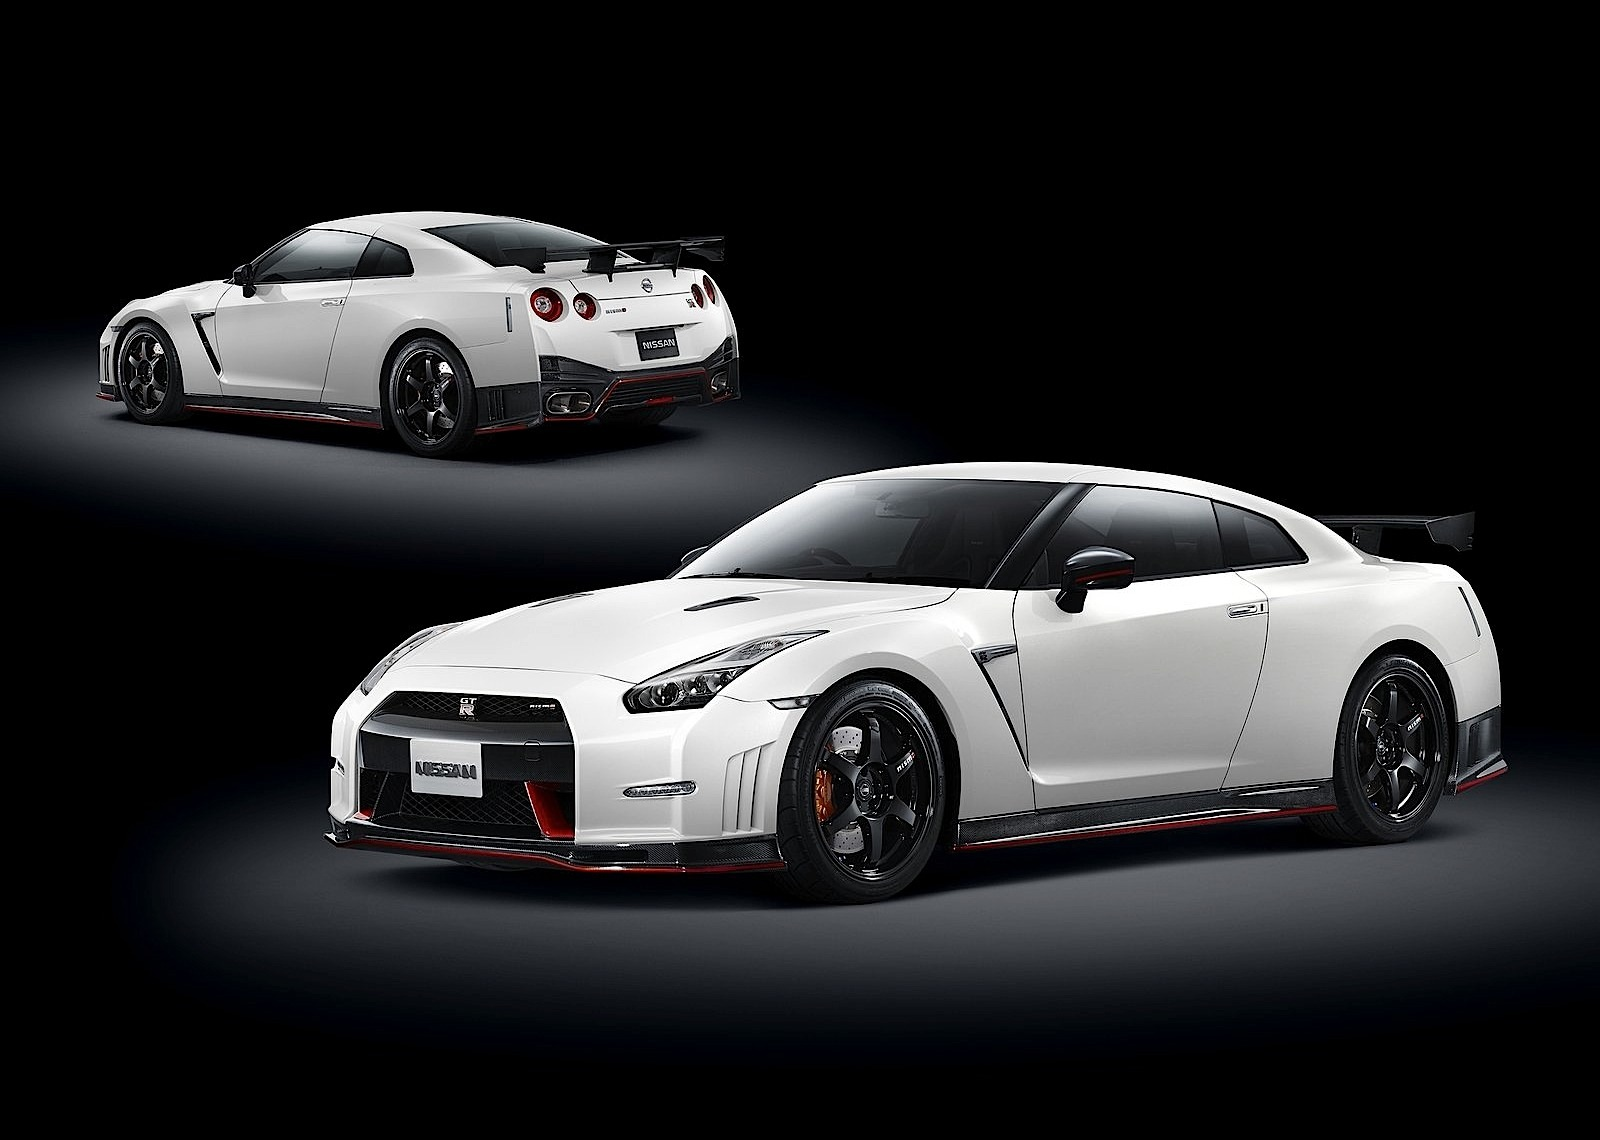 Fastest Car In The World 2015 >> NISSAN GT-R (R35) Nismo specs & photos - 2014, 2015, 2016 ...